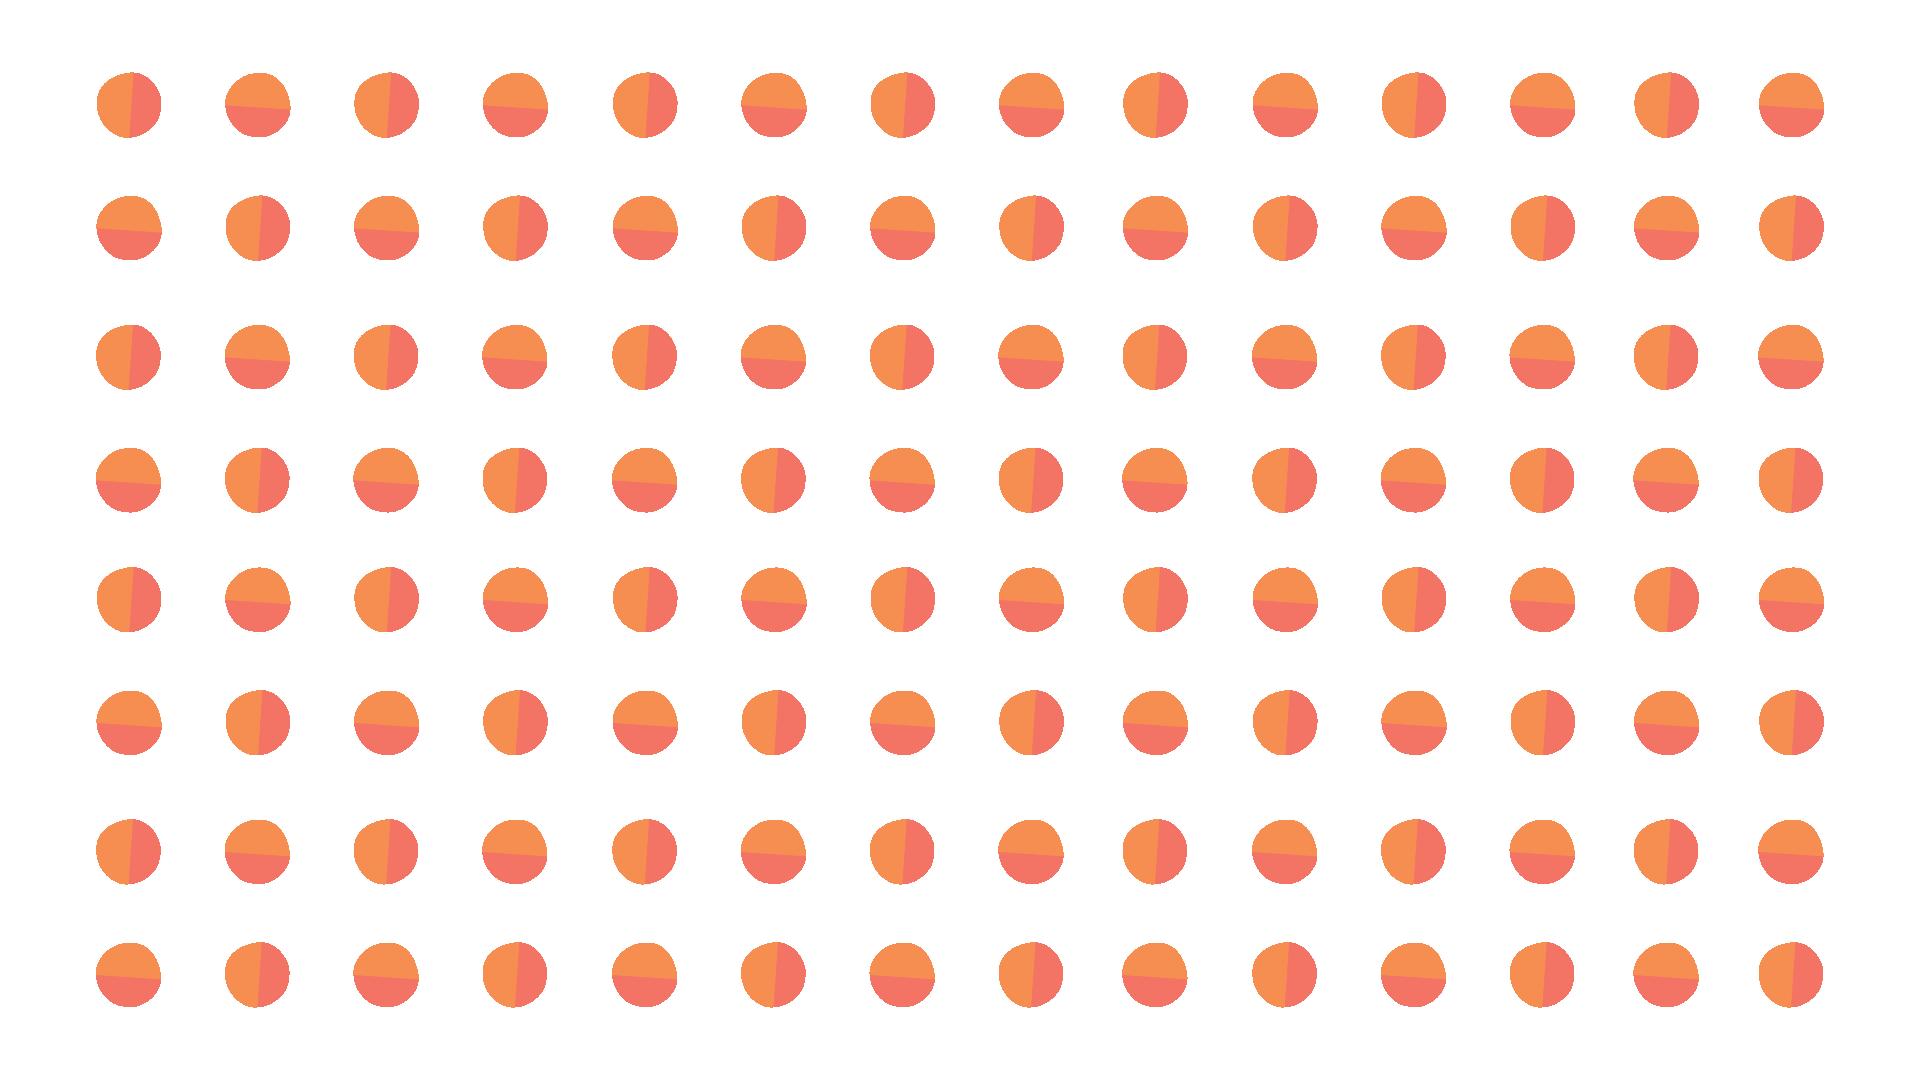 OP-patterns-6.png